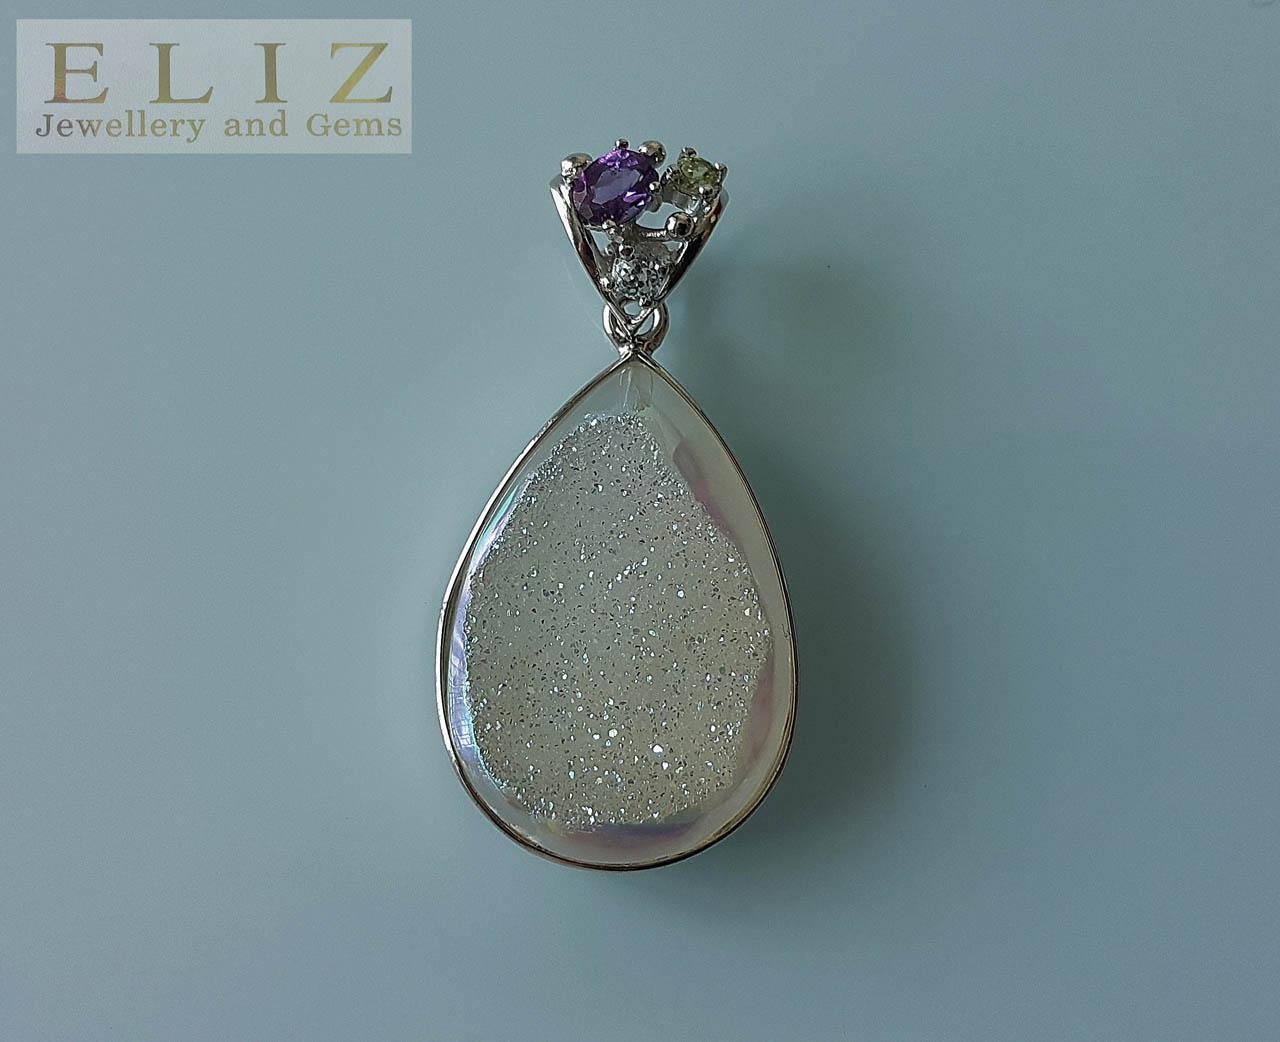 Pear Shape Blue Sparking Pendant 2.9x4.5 Fine Jewelry 20.83 Gm 925 Sterling Silver Pendant Jewelry Titanium Druzy Gemstone Pendant